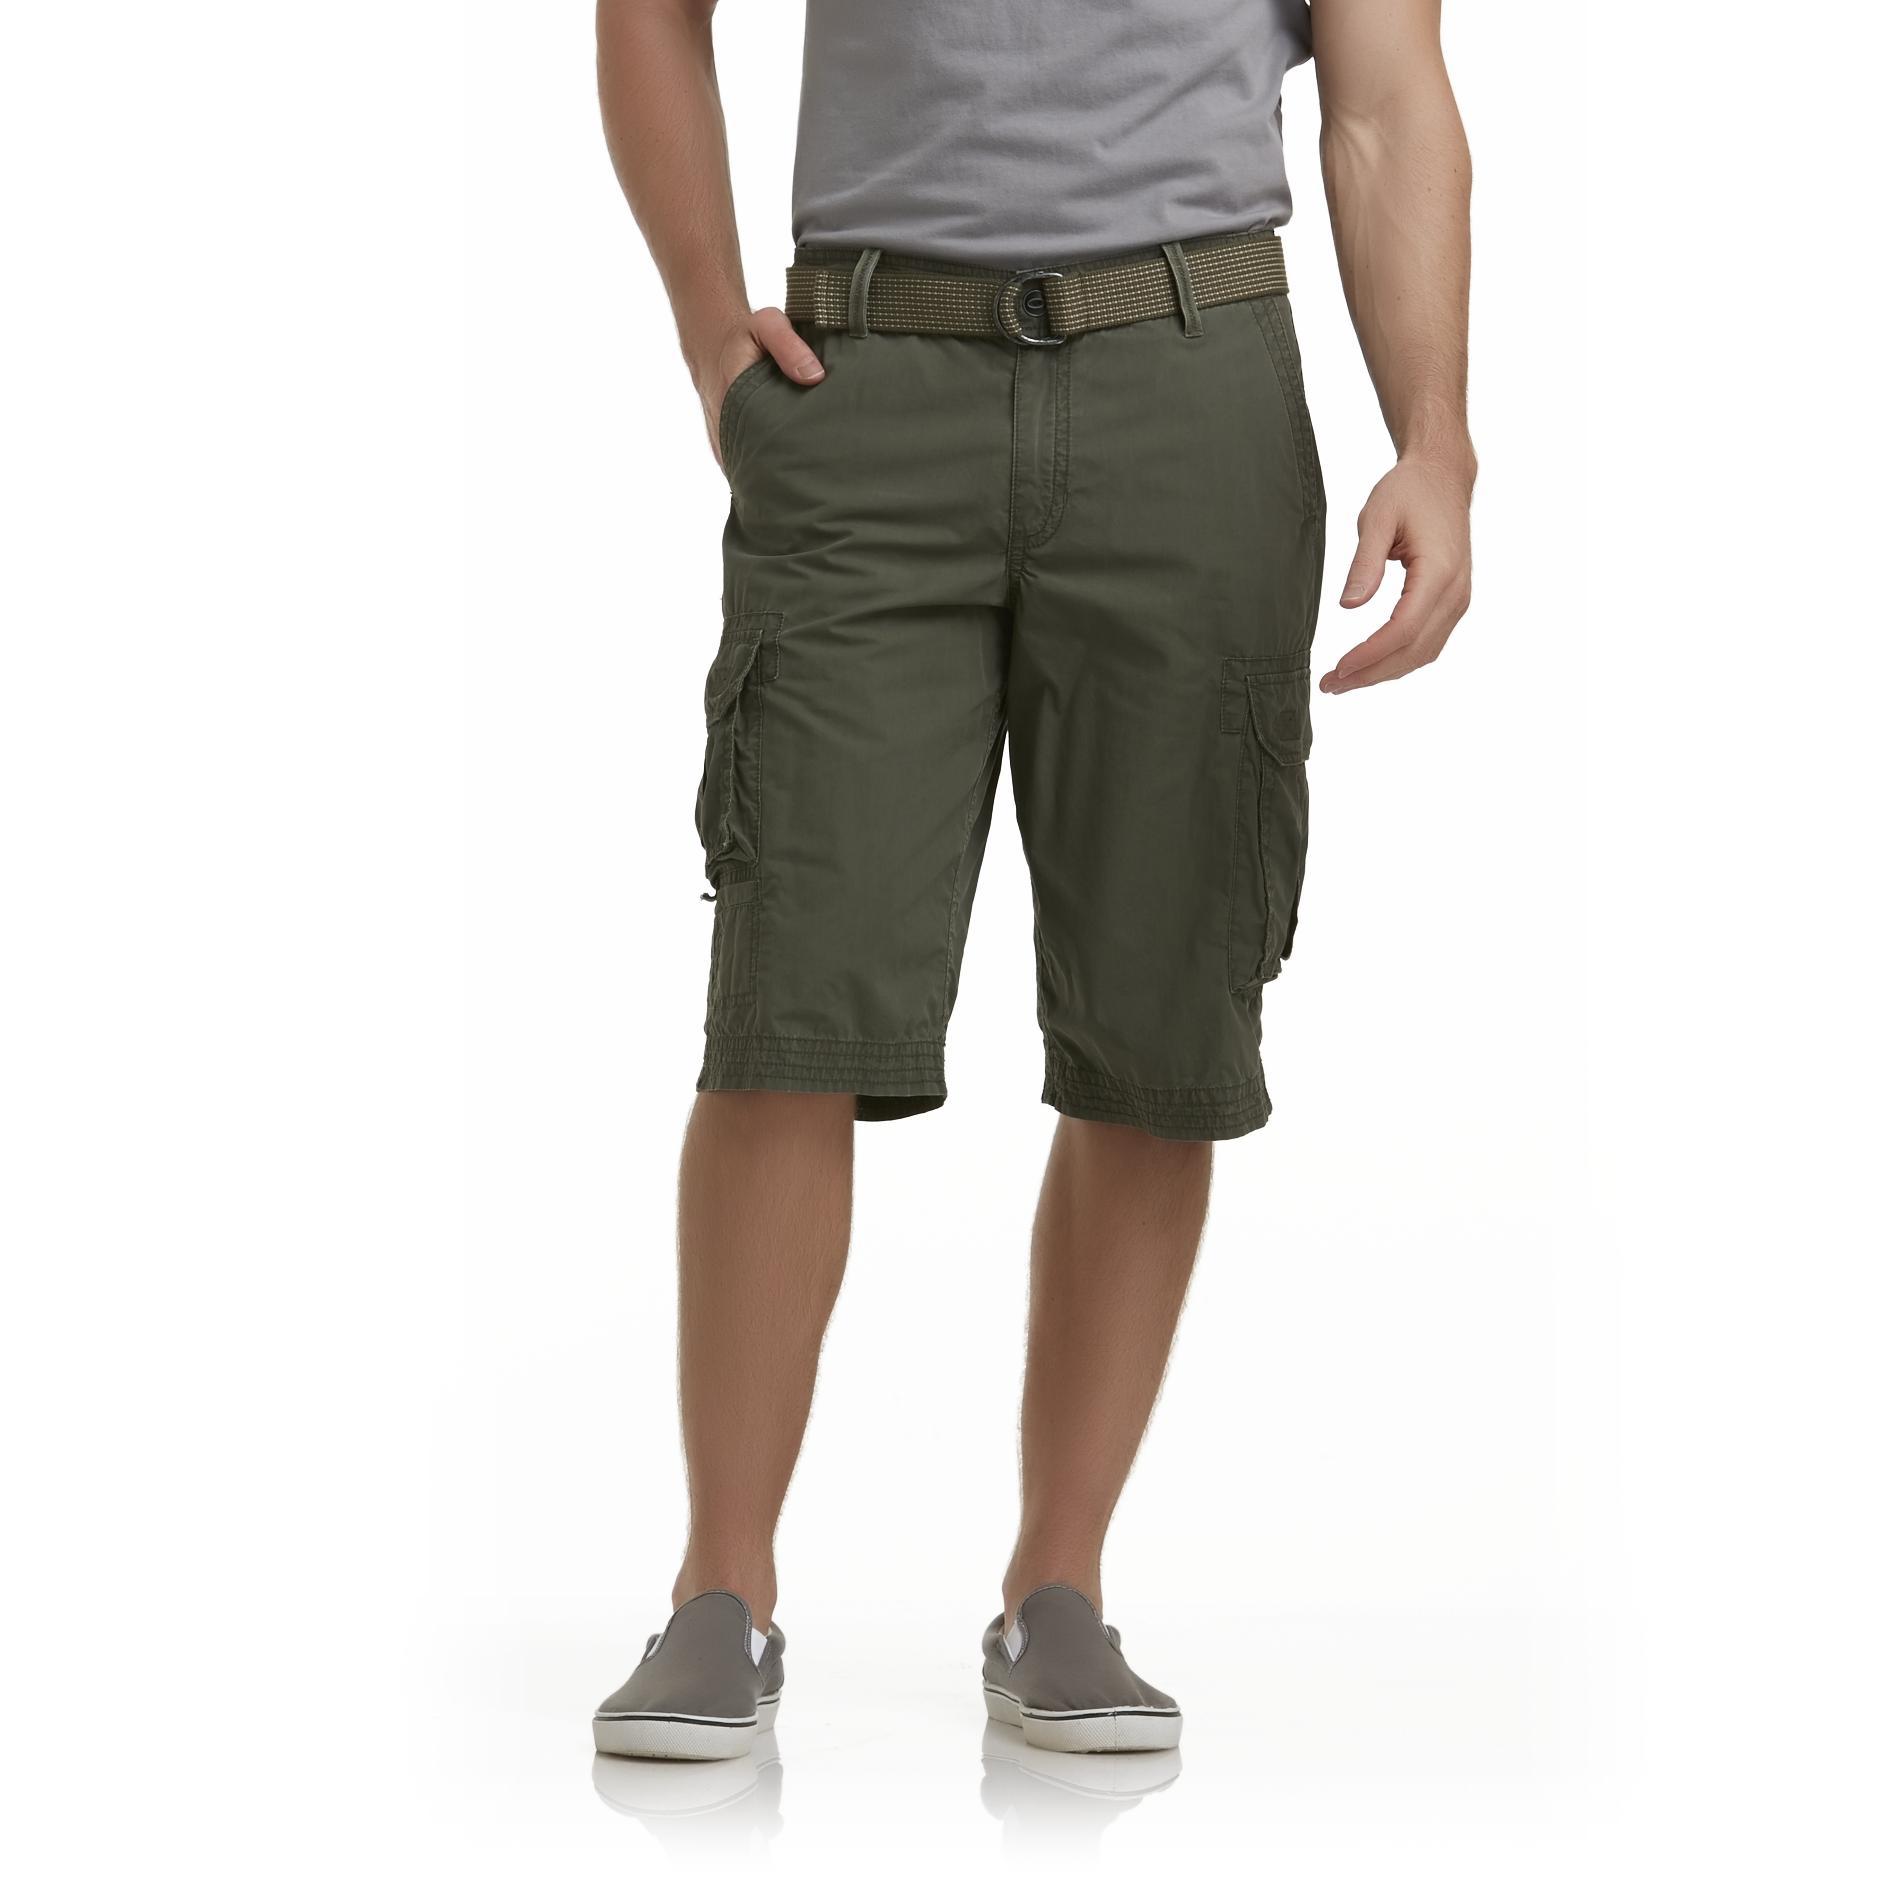 Route 66 Men's Cargo Shorts & Belt at Kmart.com